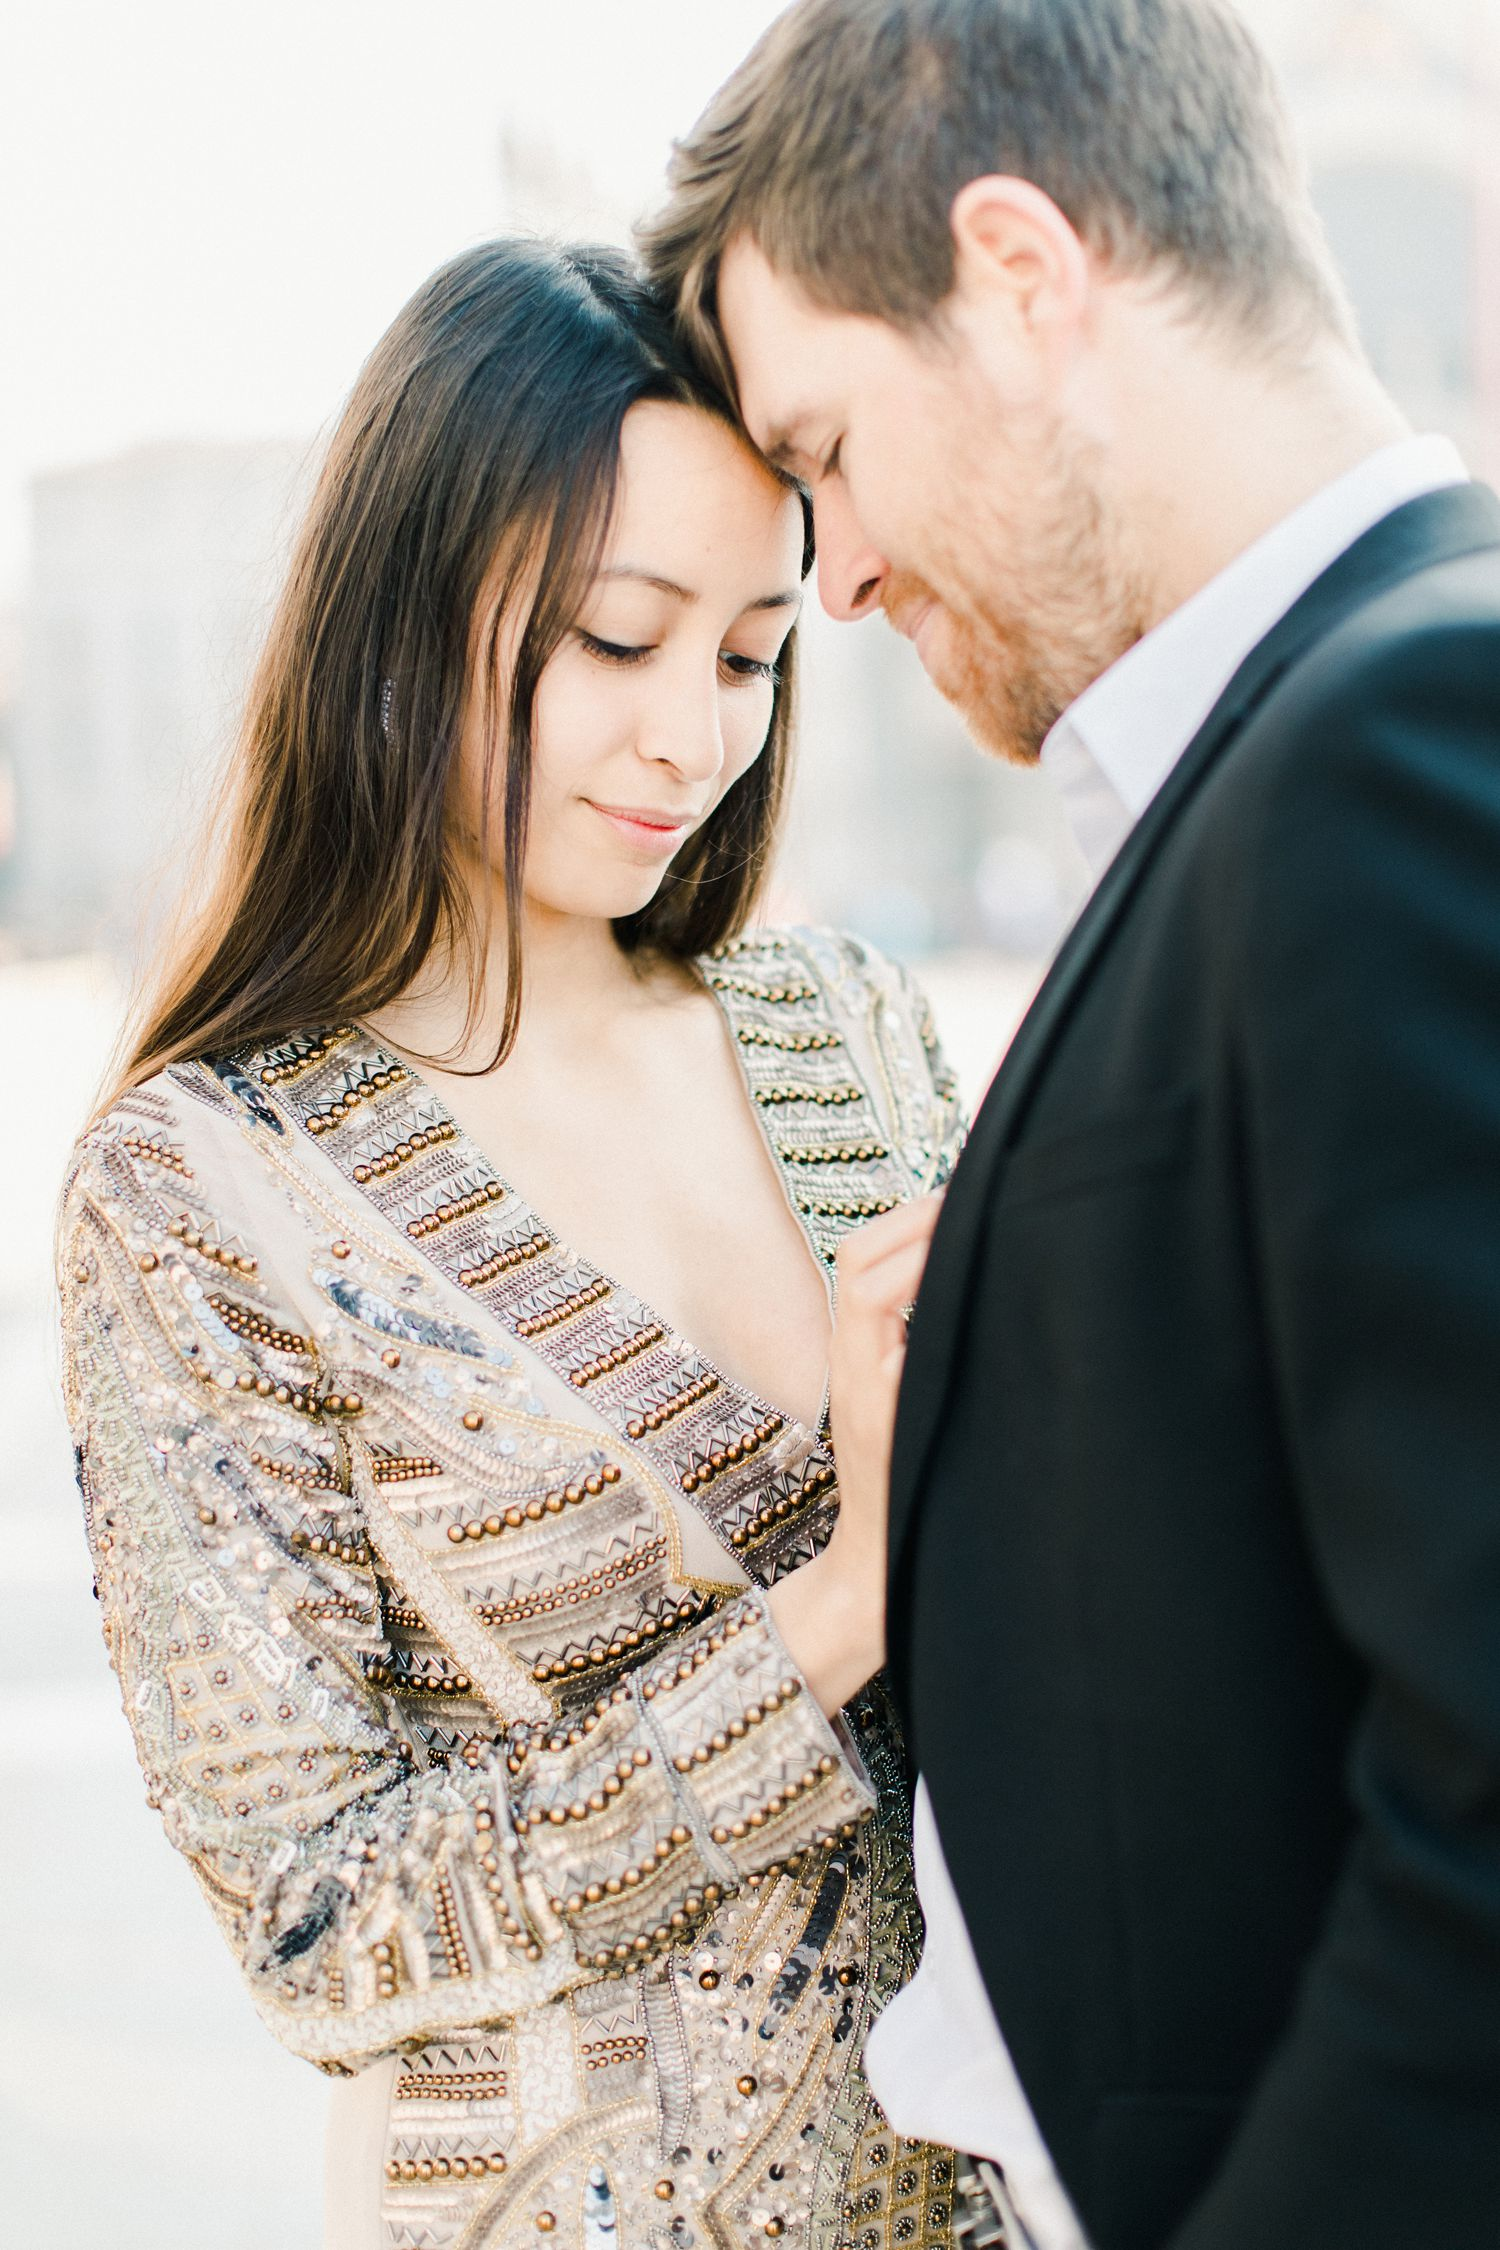 Fine-Art-Hochzeitsfotografie-Hochzeitsfotograf-Venedig-Venice-Toskana-Italien-Fine-Art-Wedding-Photography-Italy_2553